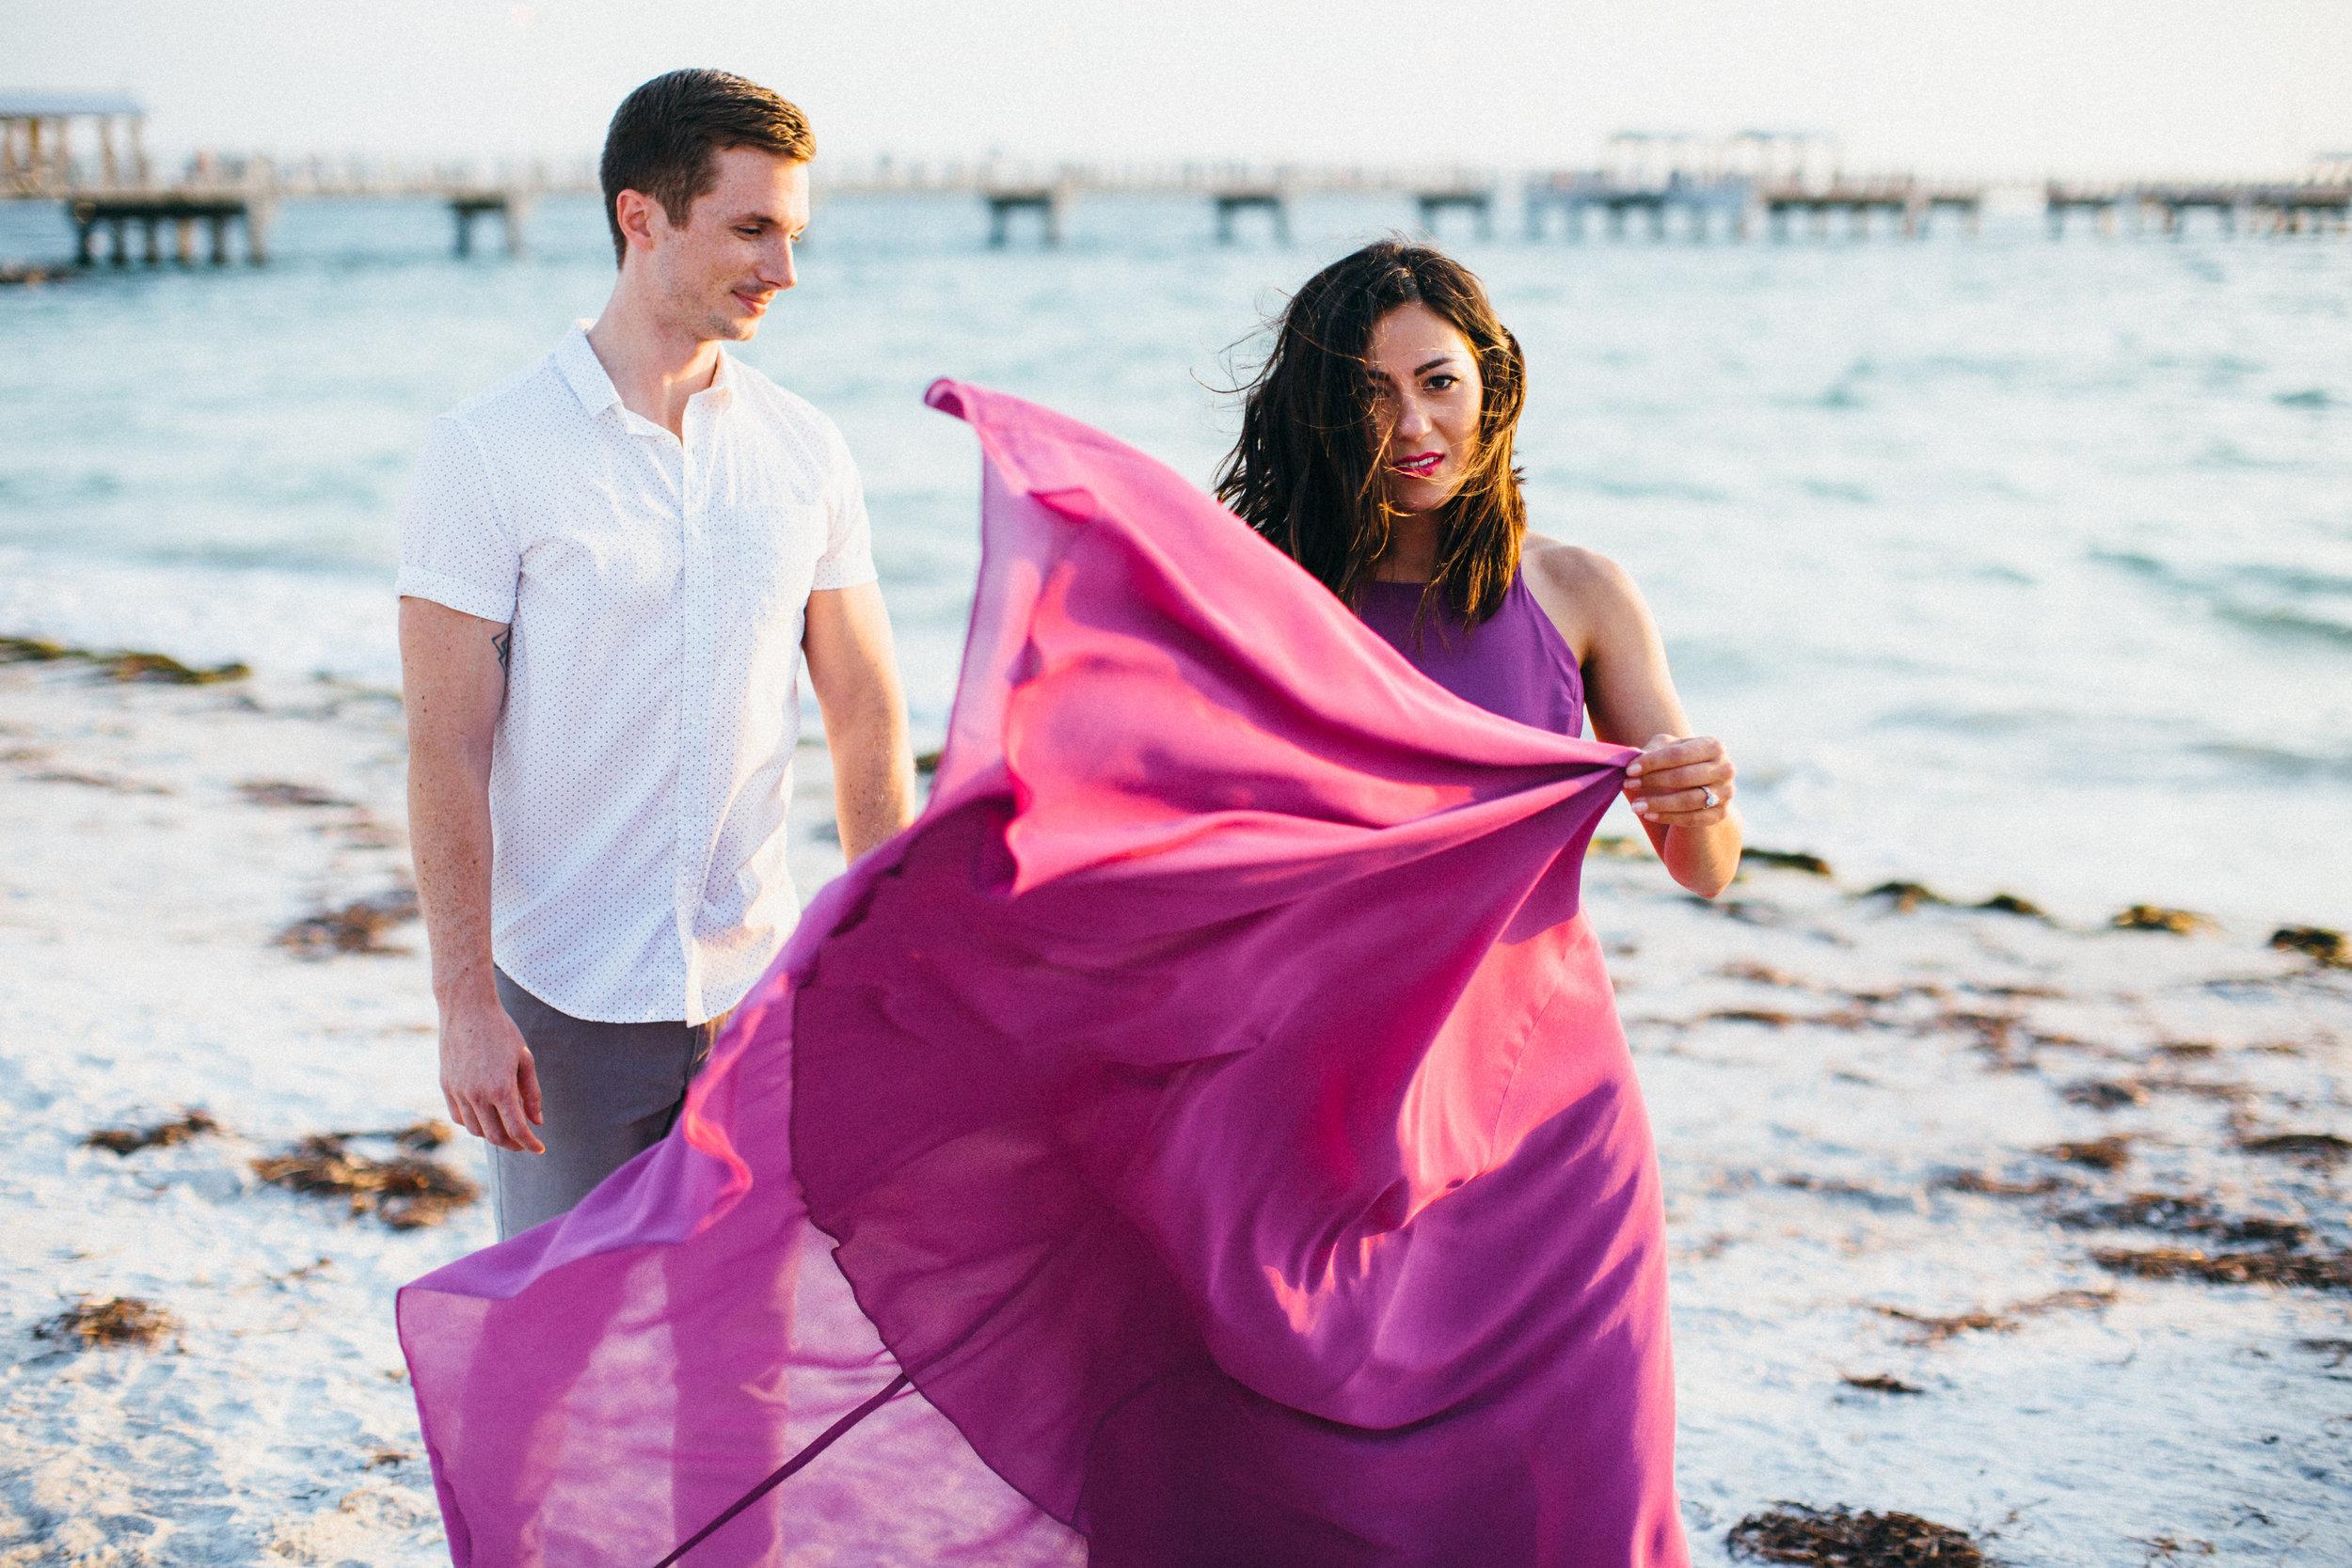 Priska & Russell | Engagement | Downtown St. Petersburg & Ft. De Soto, Florida | Benjamin Hewitt Photography